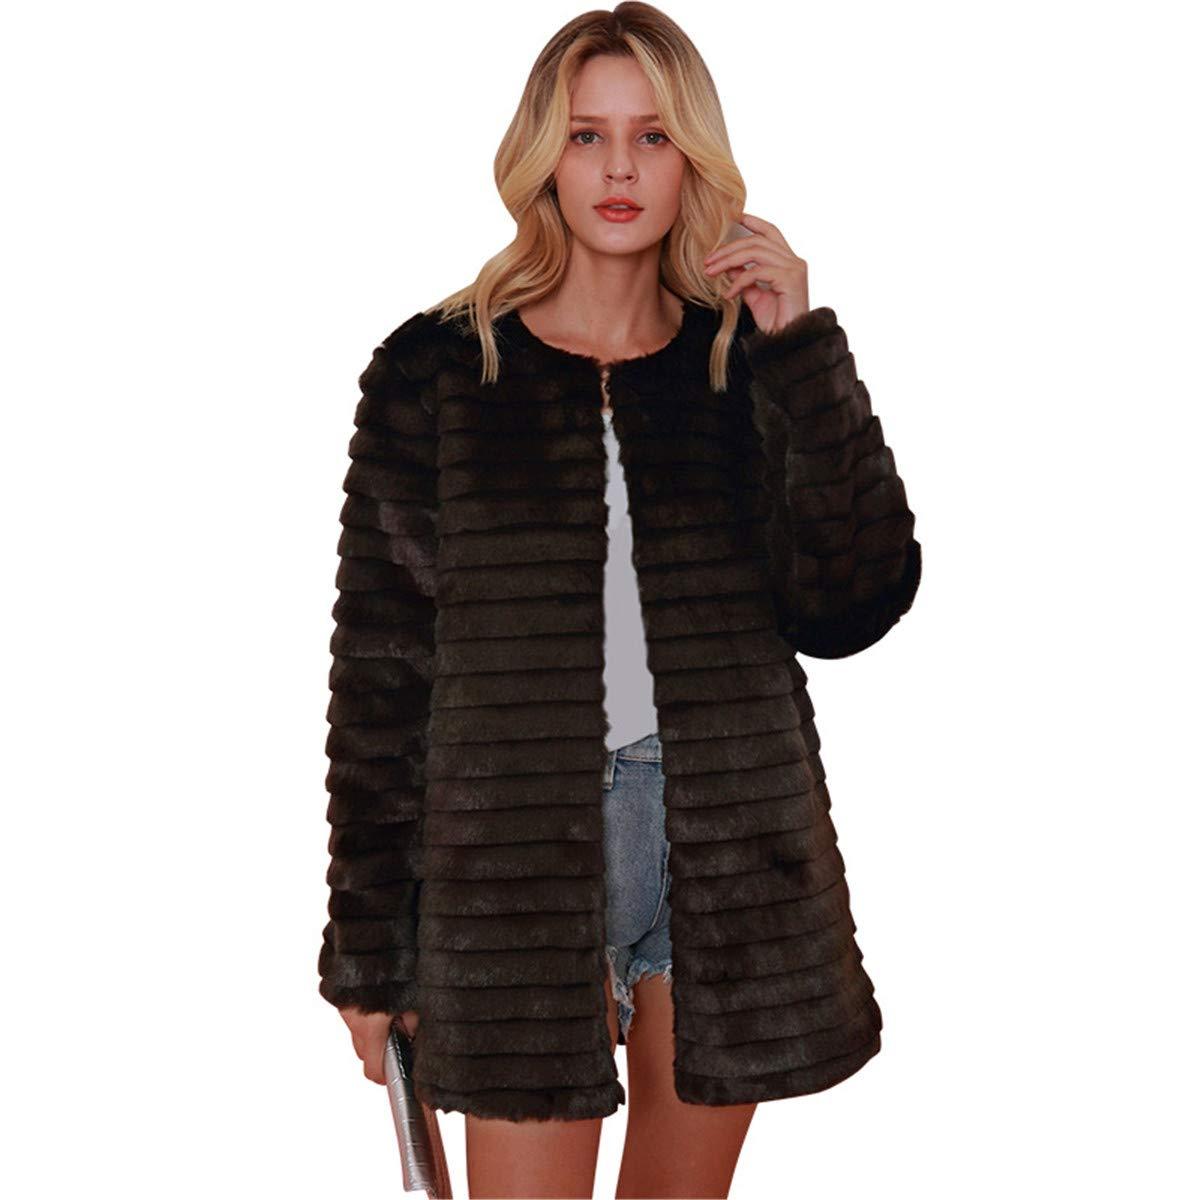 Leepus Women Coat Fluffy Faux Fur Solid Color Stripes Long Sleeve Warm Autumn Winter Hairy Luxury Jacket Coffee by Leepus